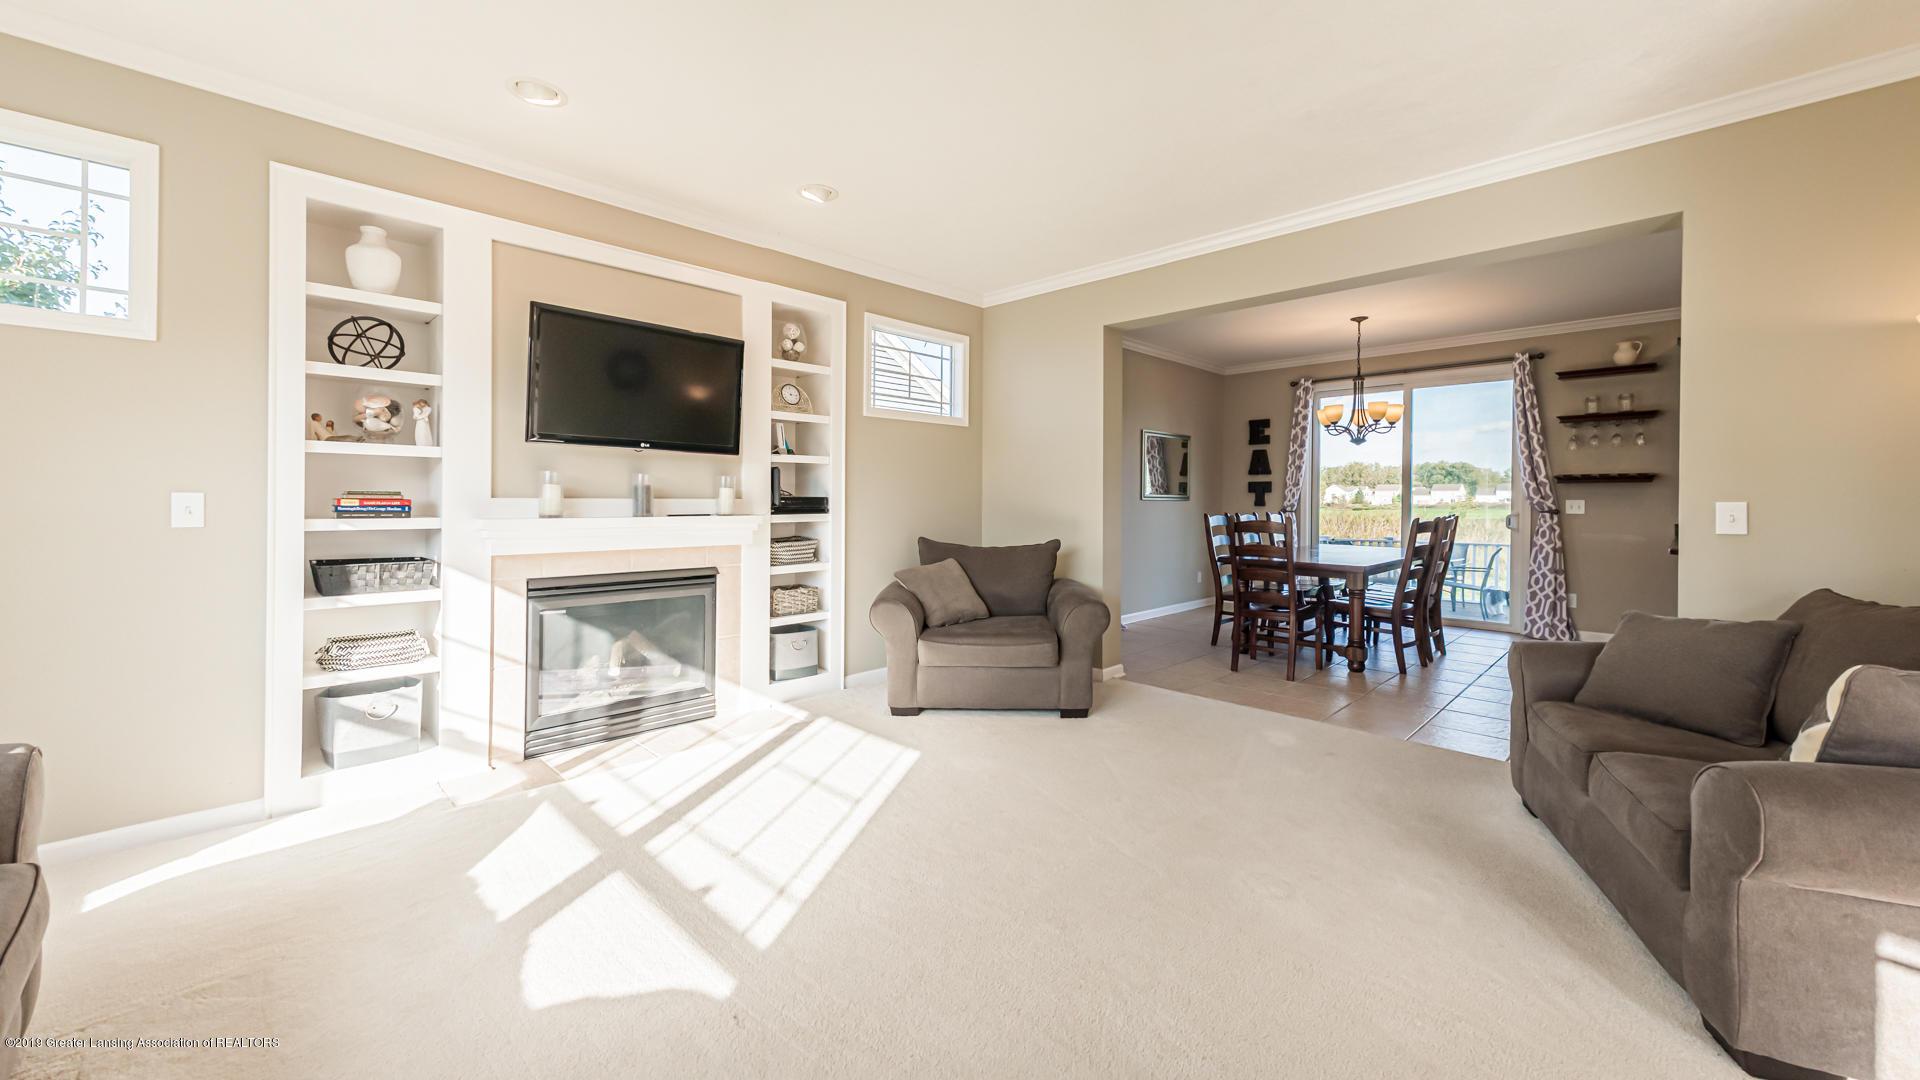 3742 Shearwater Ln - living room - 7